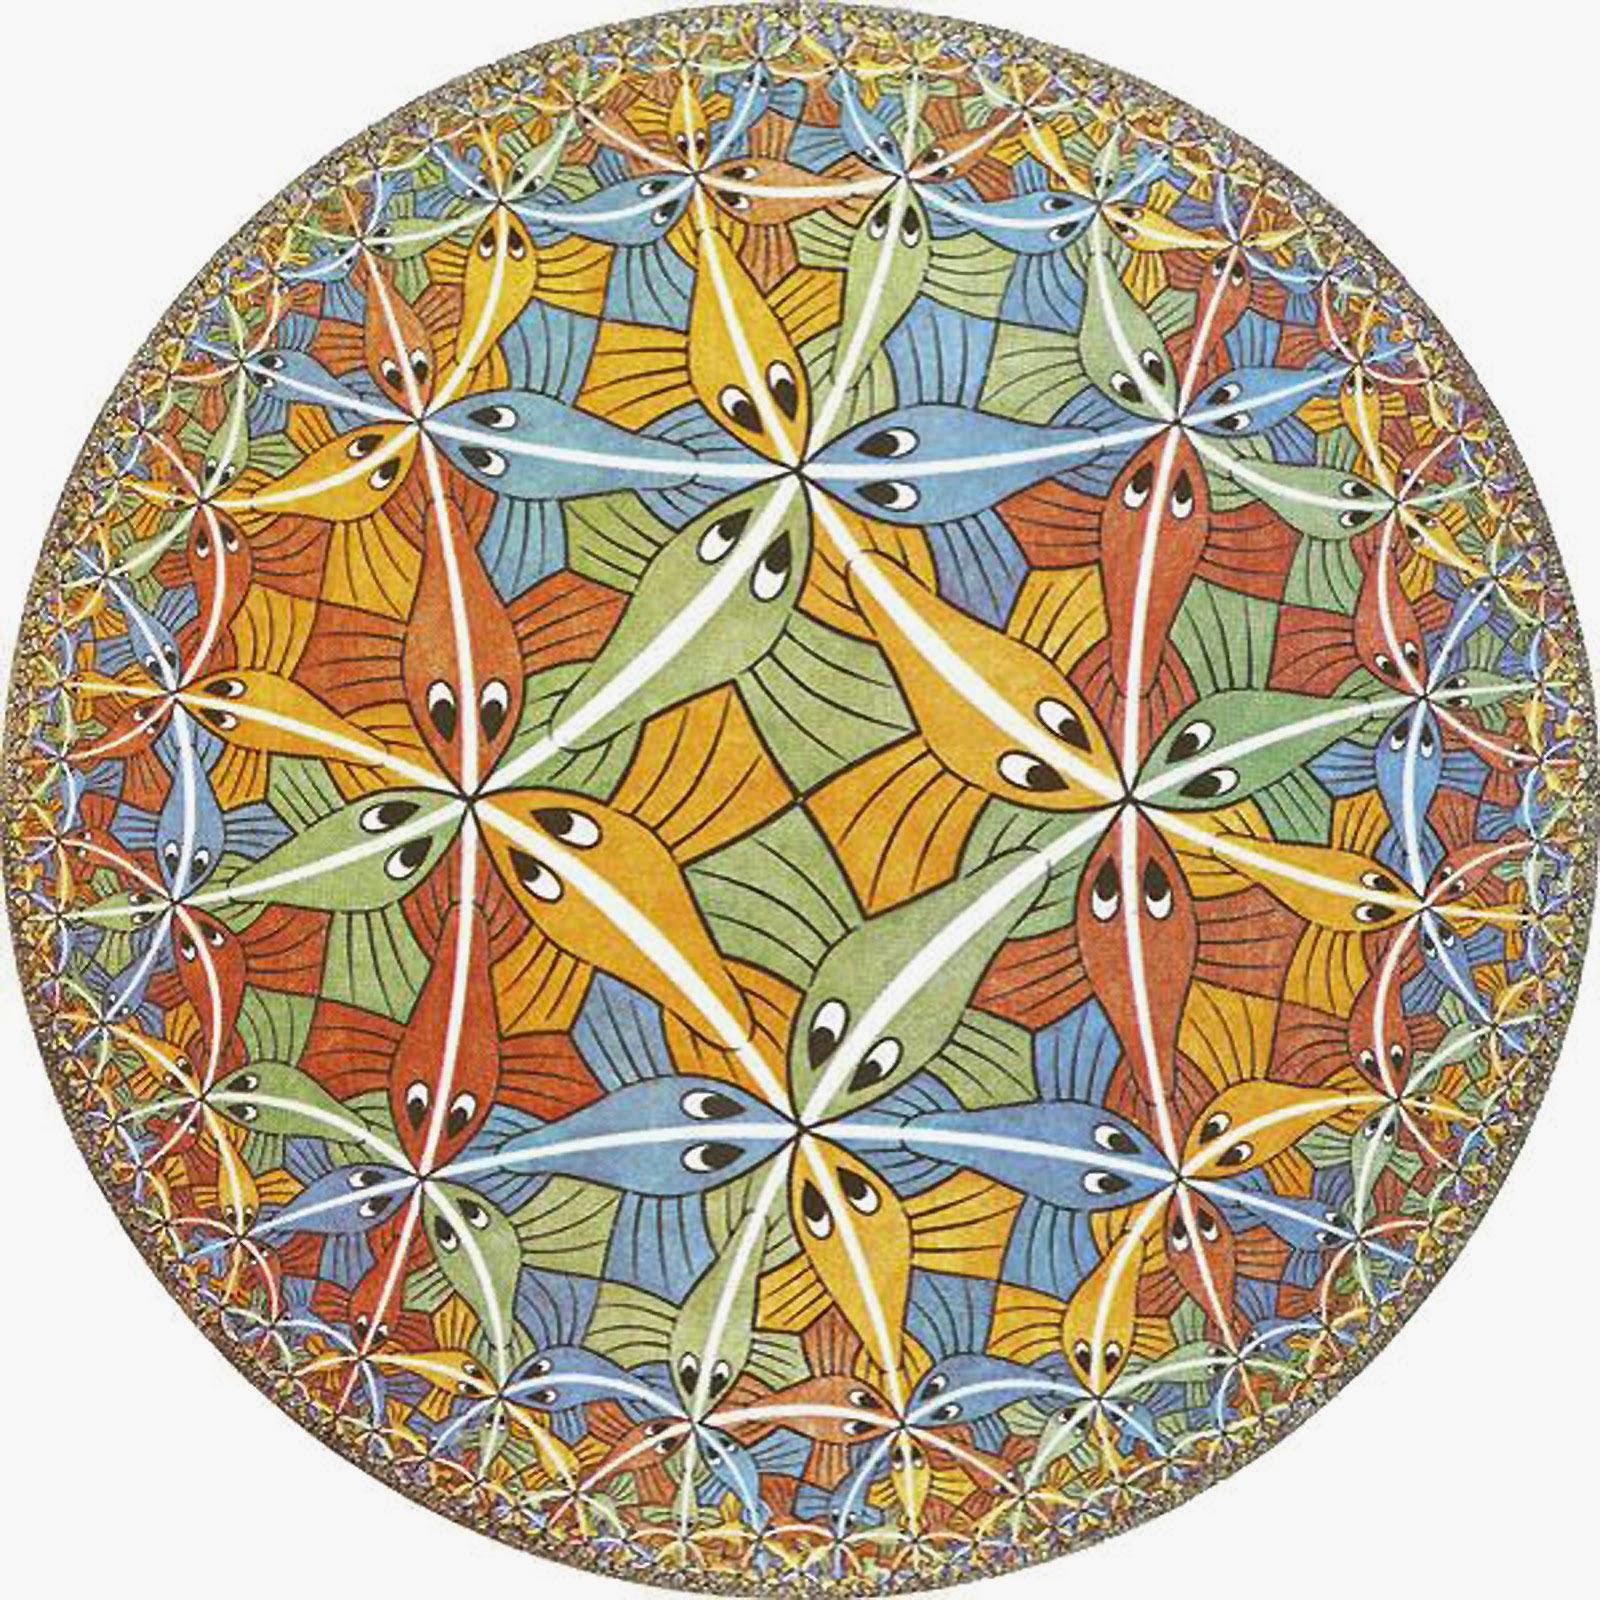 Circle Limit III, M. C. Escher